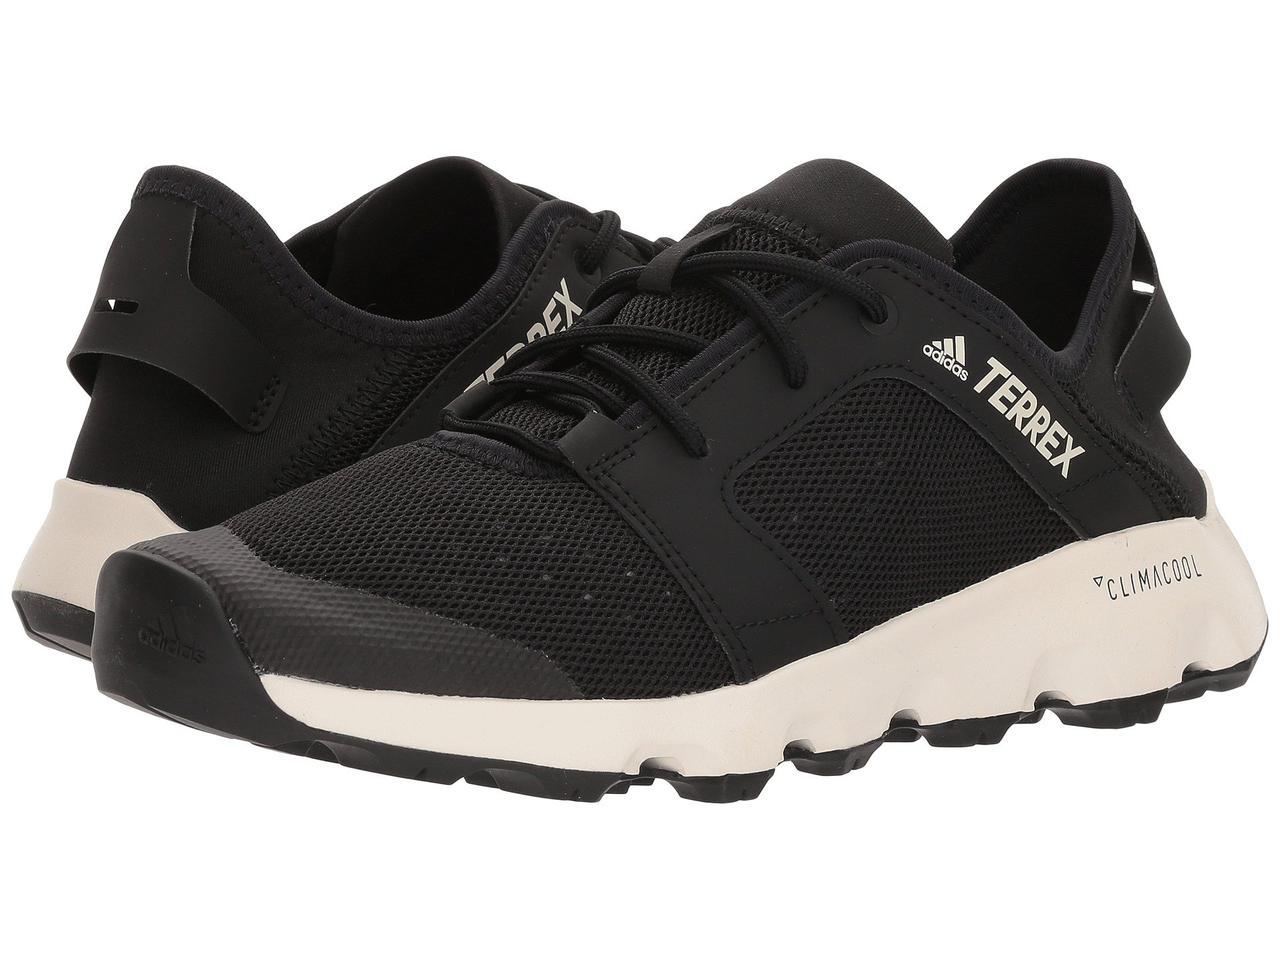 Кроссовки/Кеды (Оригинал) adidas Outdoor Terrex CC Voyager Sleek Black/Black/Chalk White